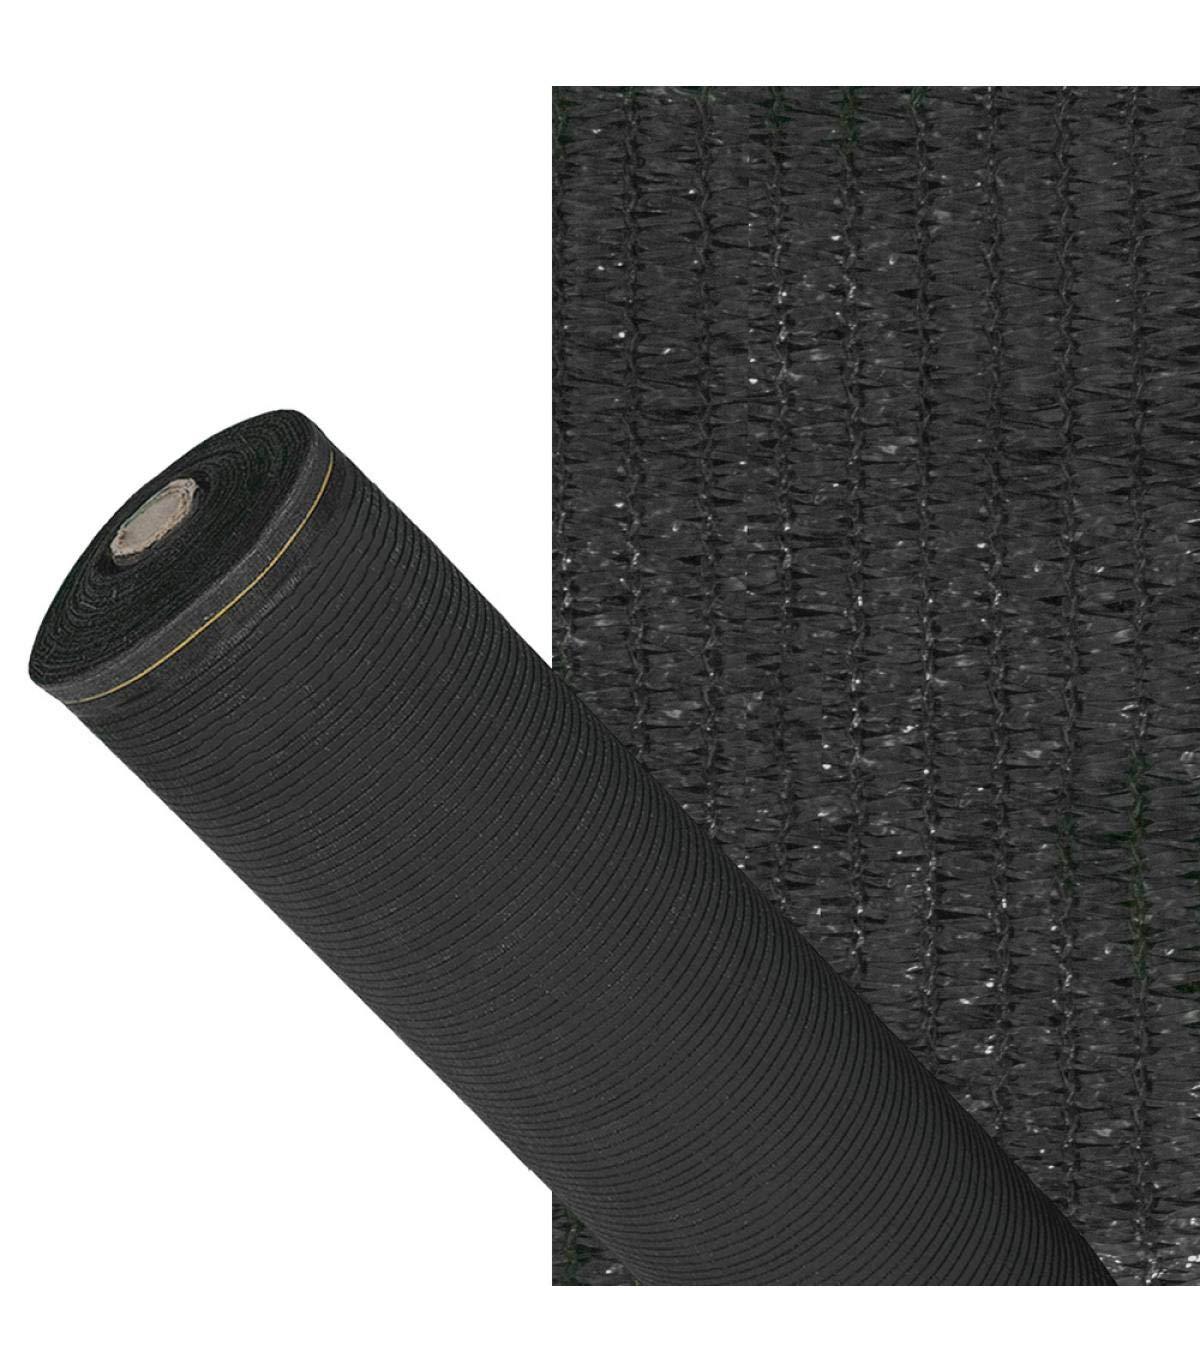 Protecci/ón Jard/ín y Terraza Rollo 3 x 100 metros Color Verde Oscuro Reduce Radiaci/ón Regula Temperatura Malla Sombreo 90/%